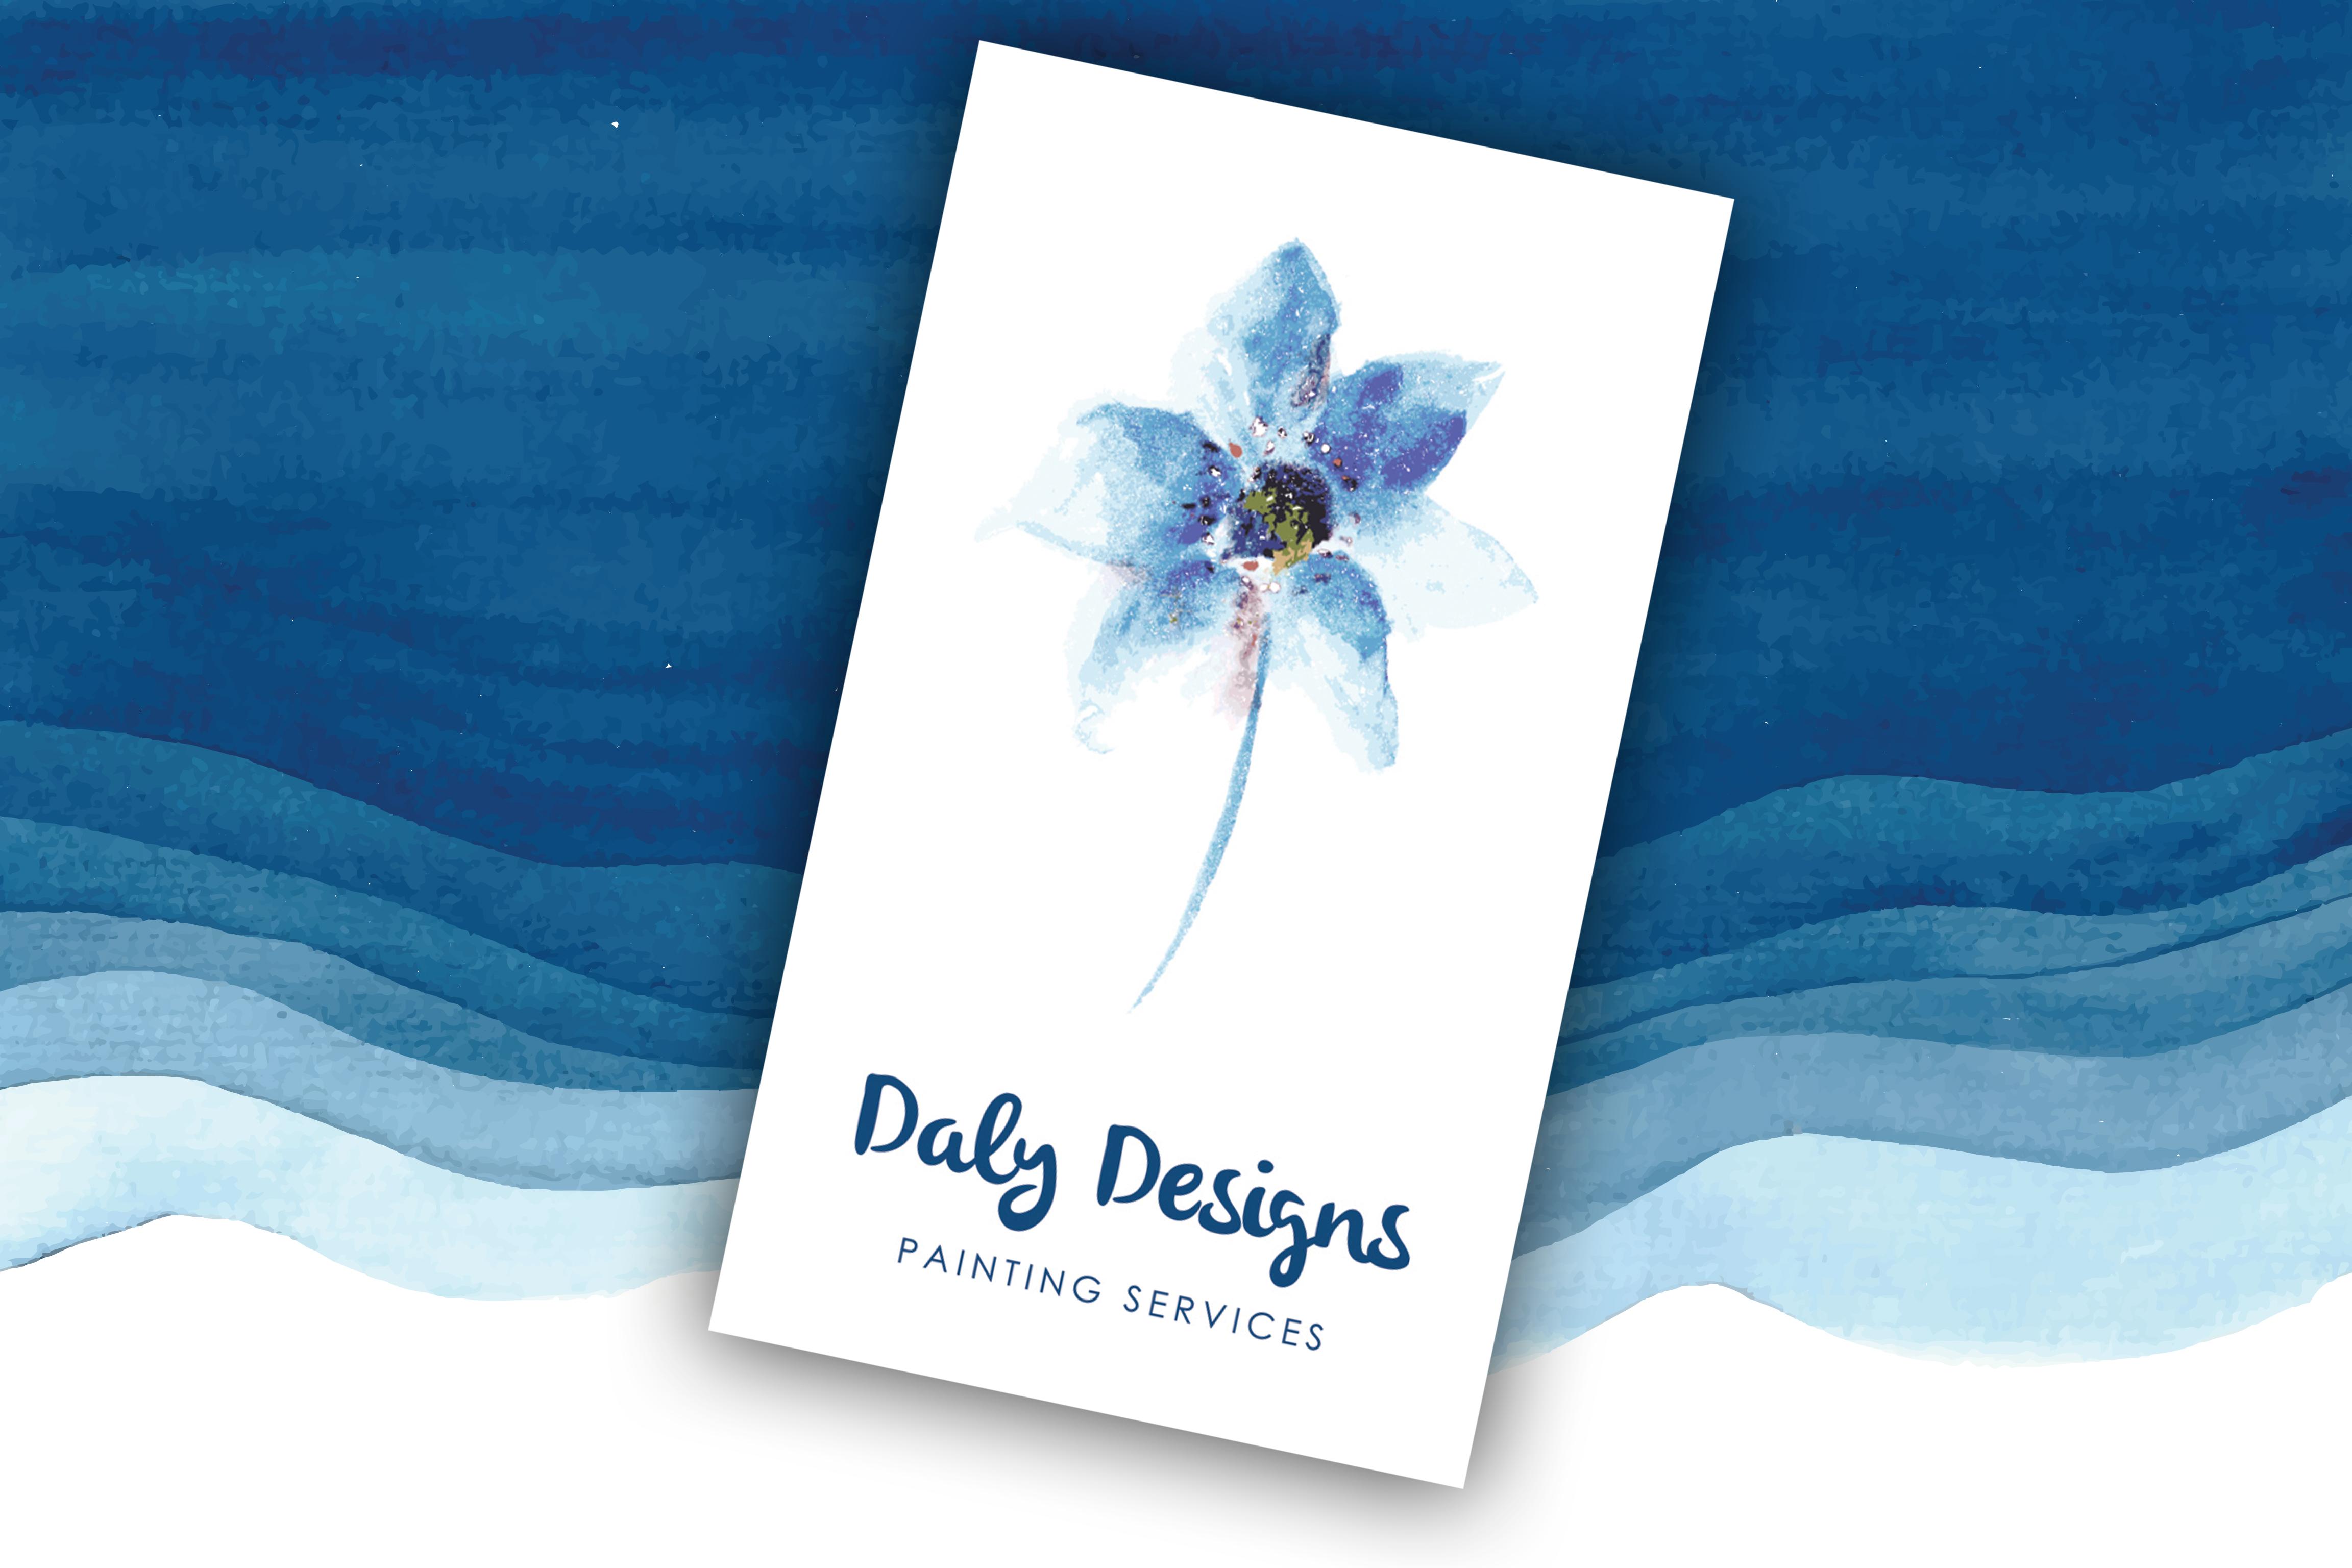 Daly Designs